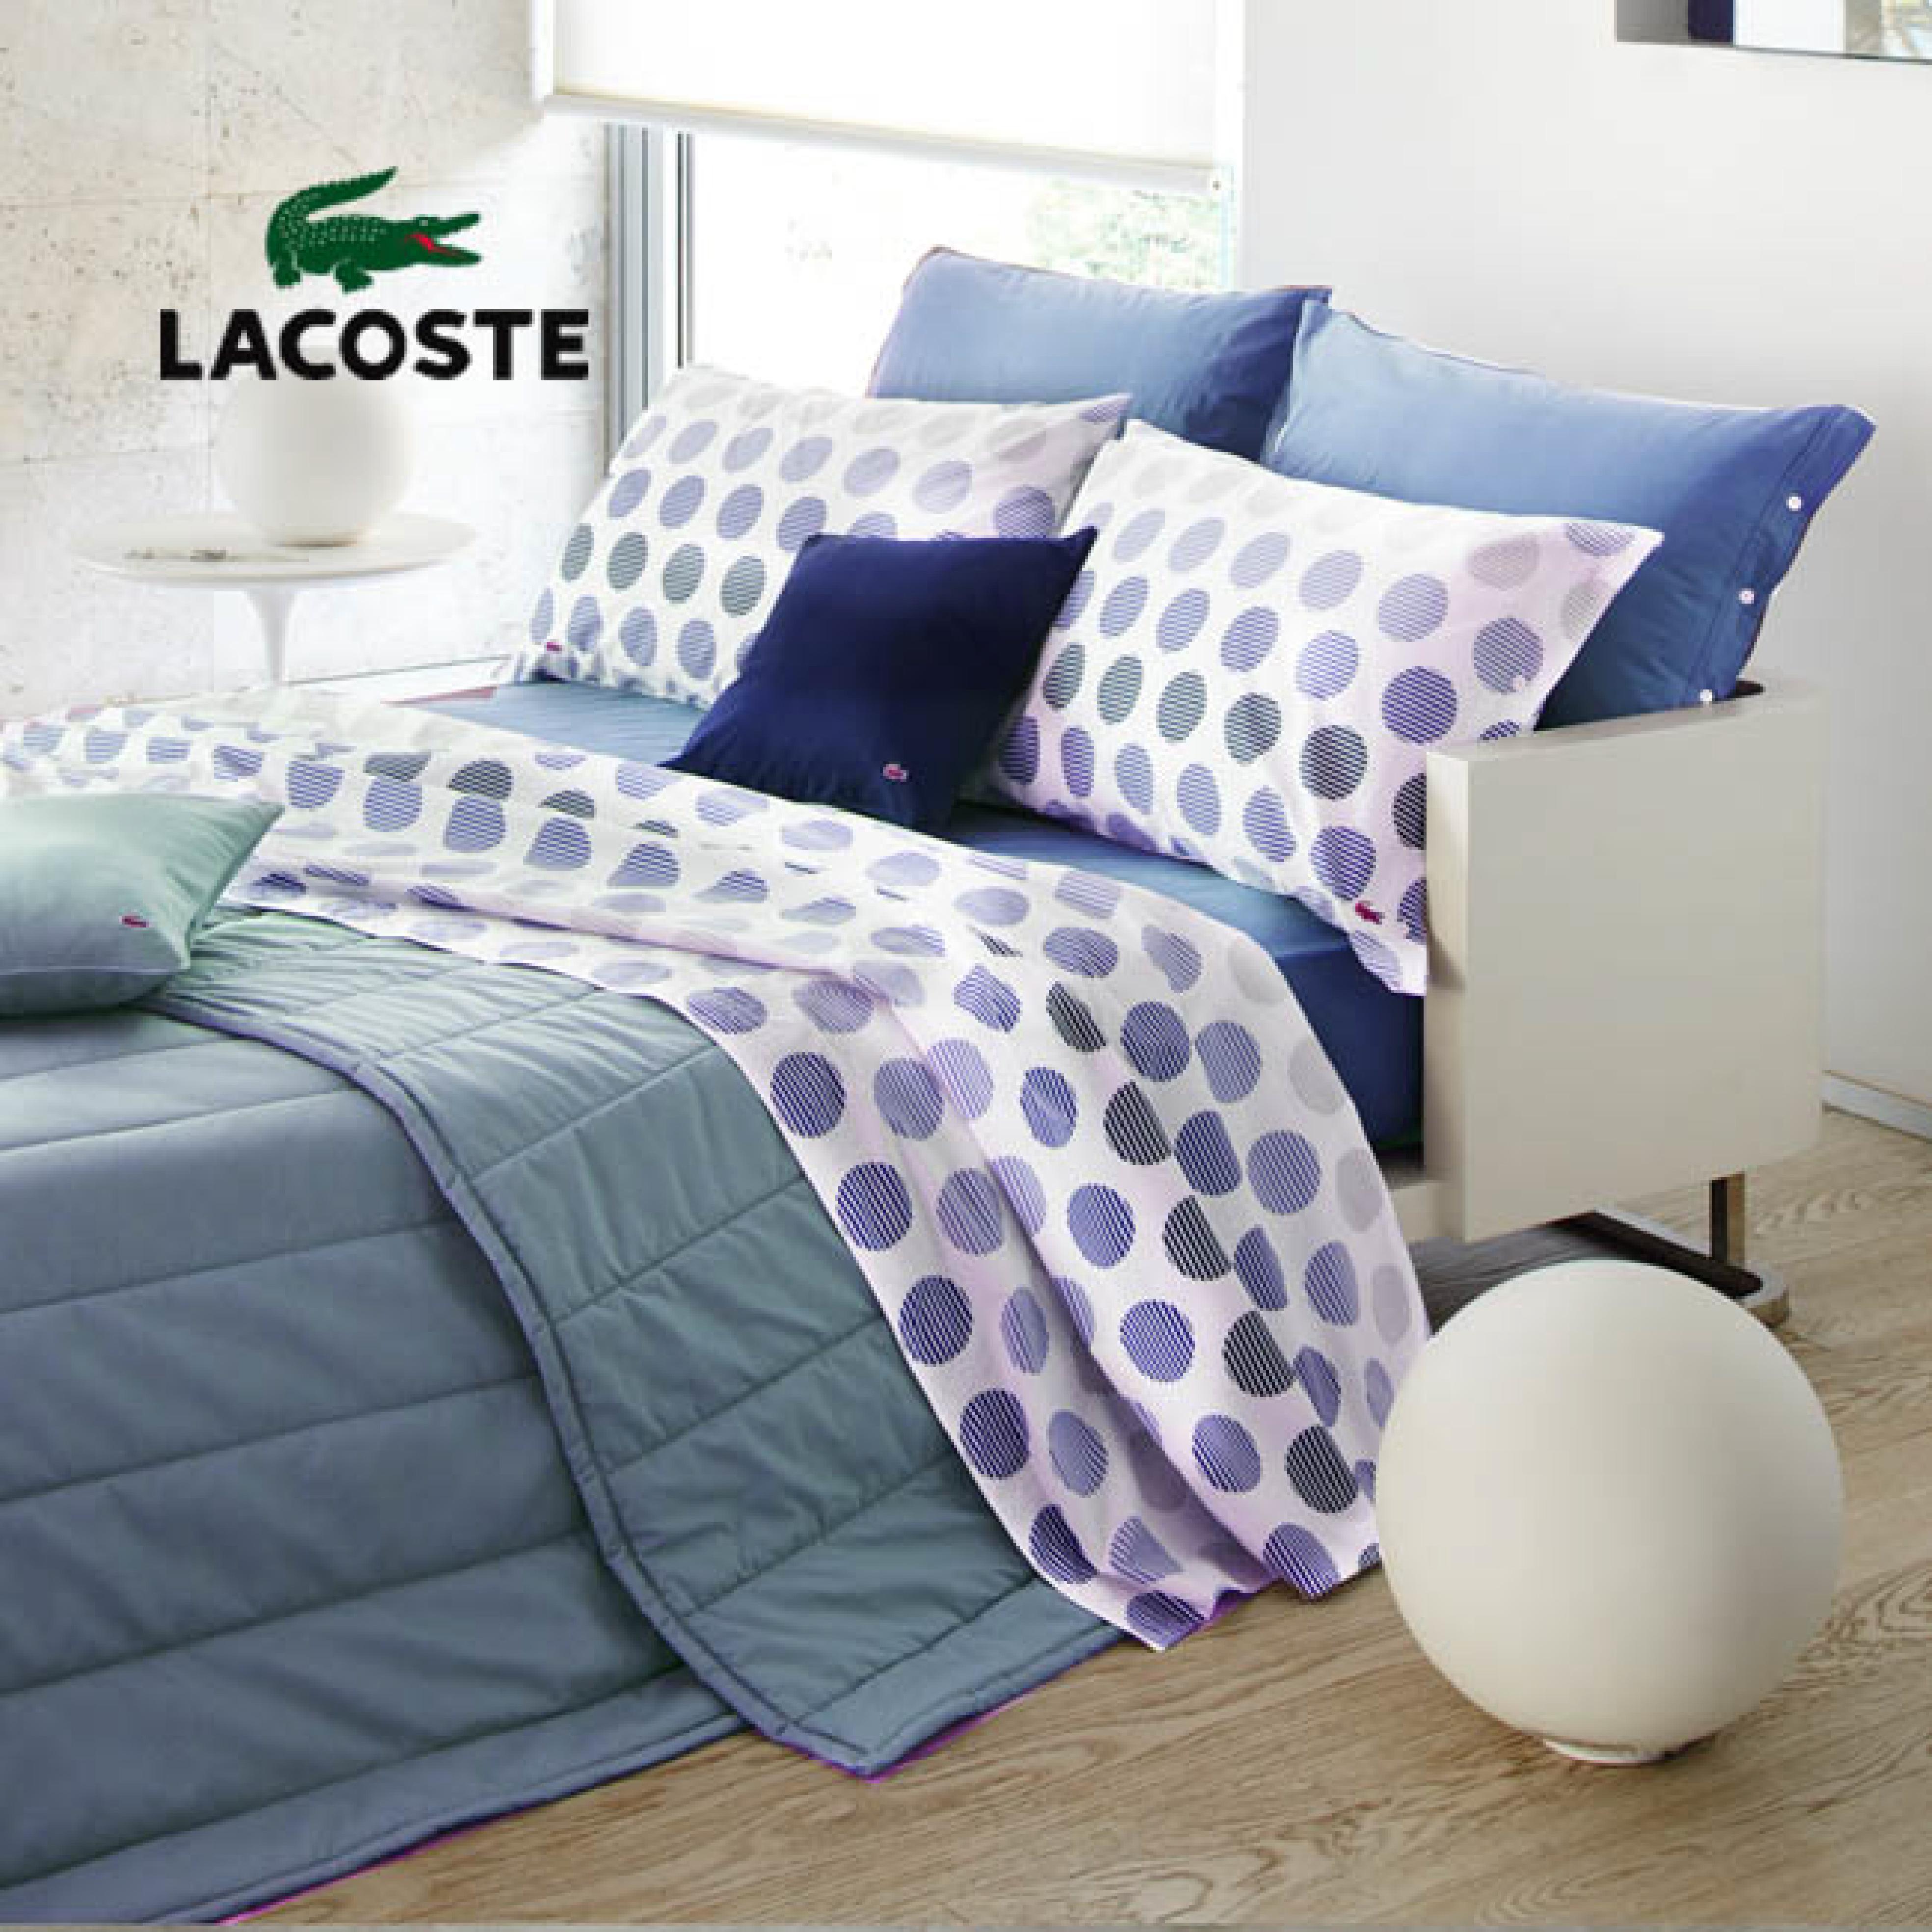 【LACOSTE】法國原裝加大床組SEVAN